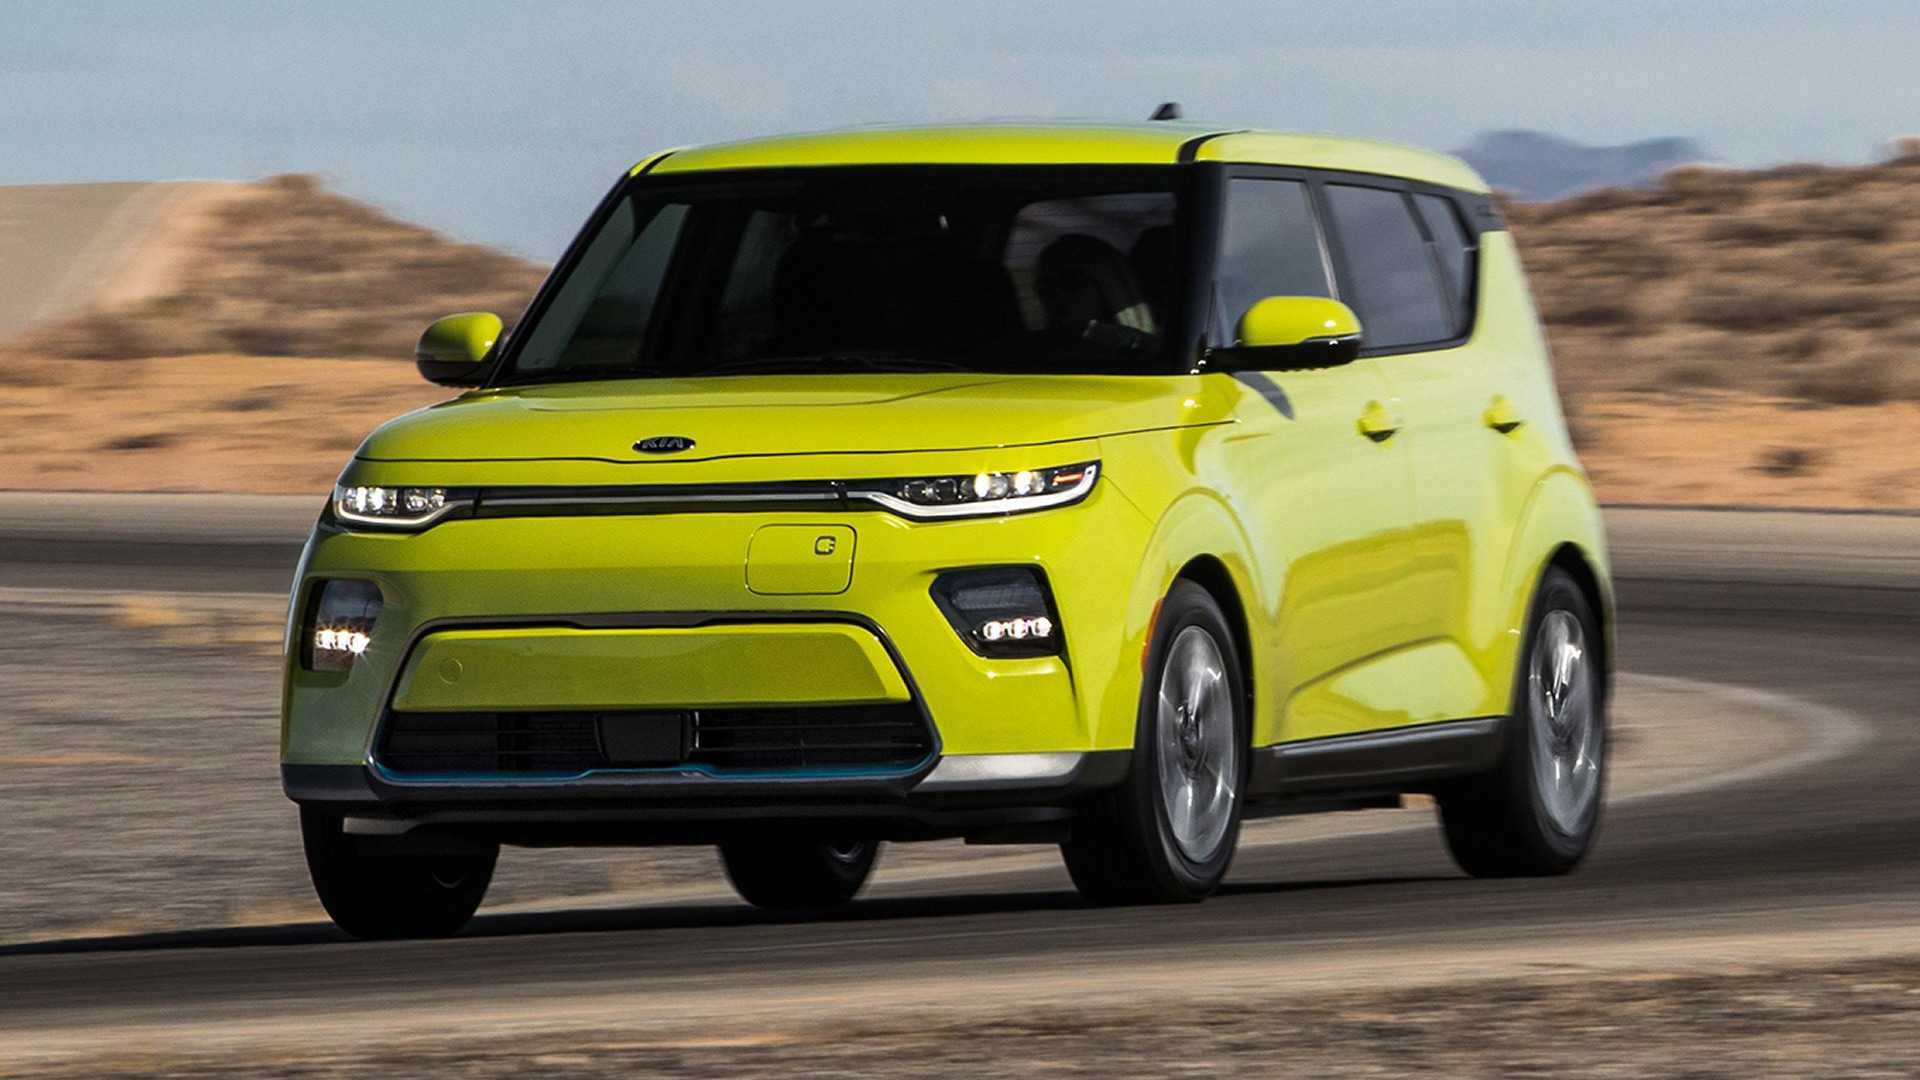 64 New Kia Electric 2020 Picture with Kia Electric 2020